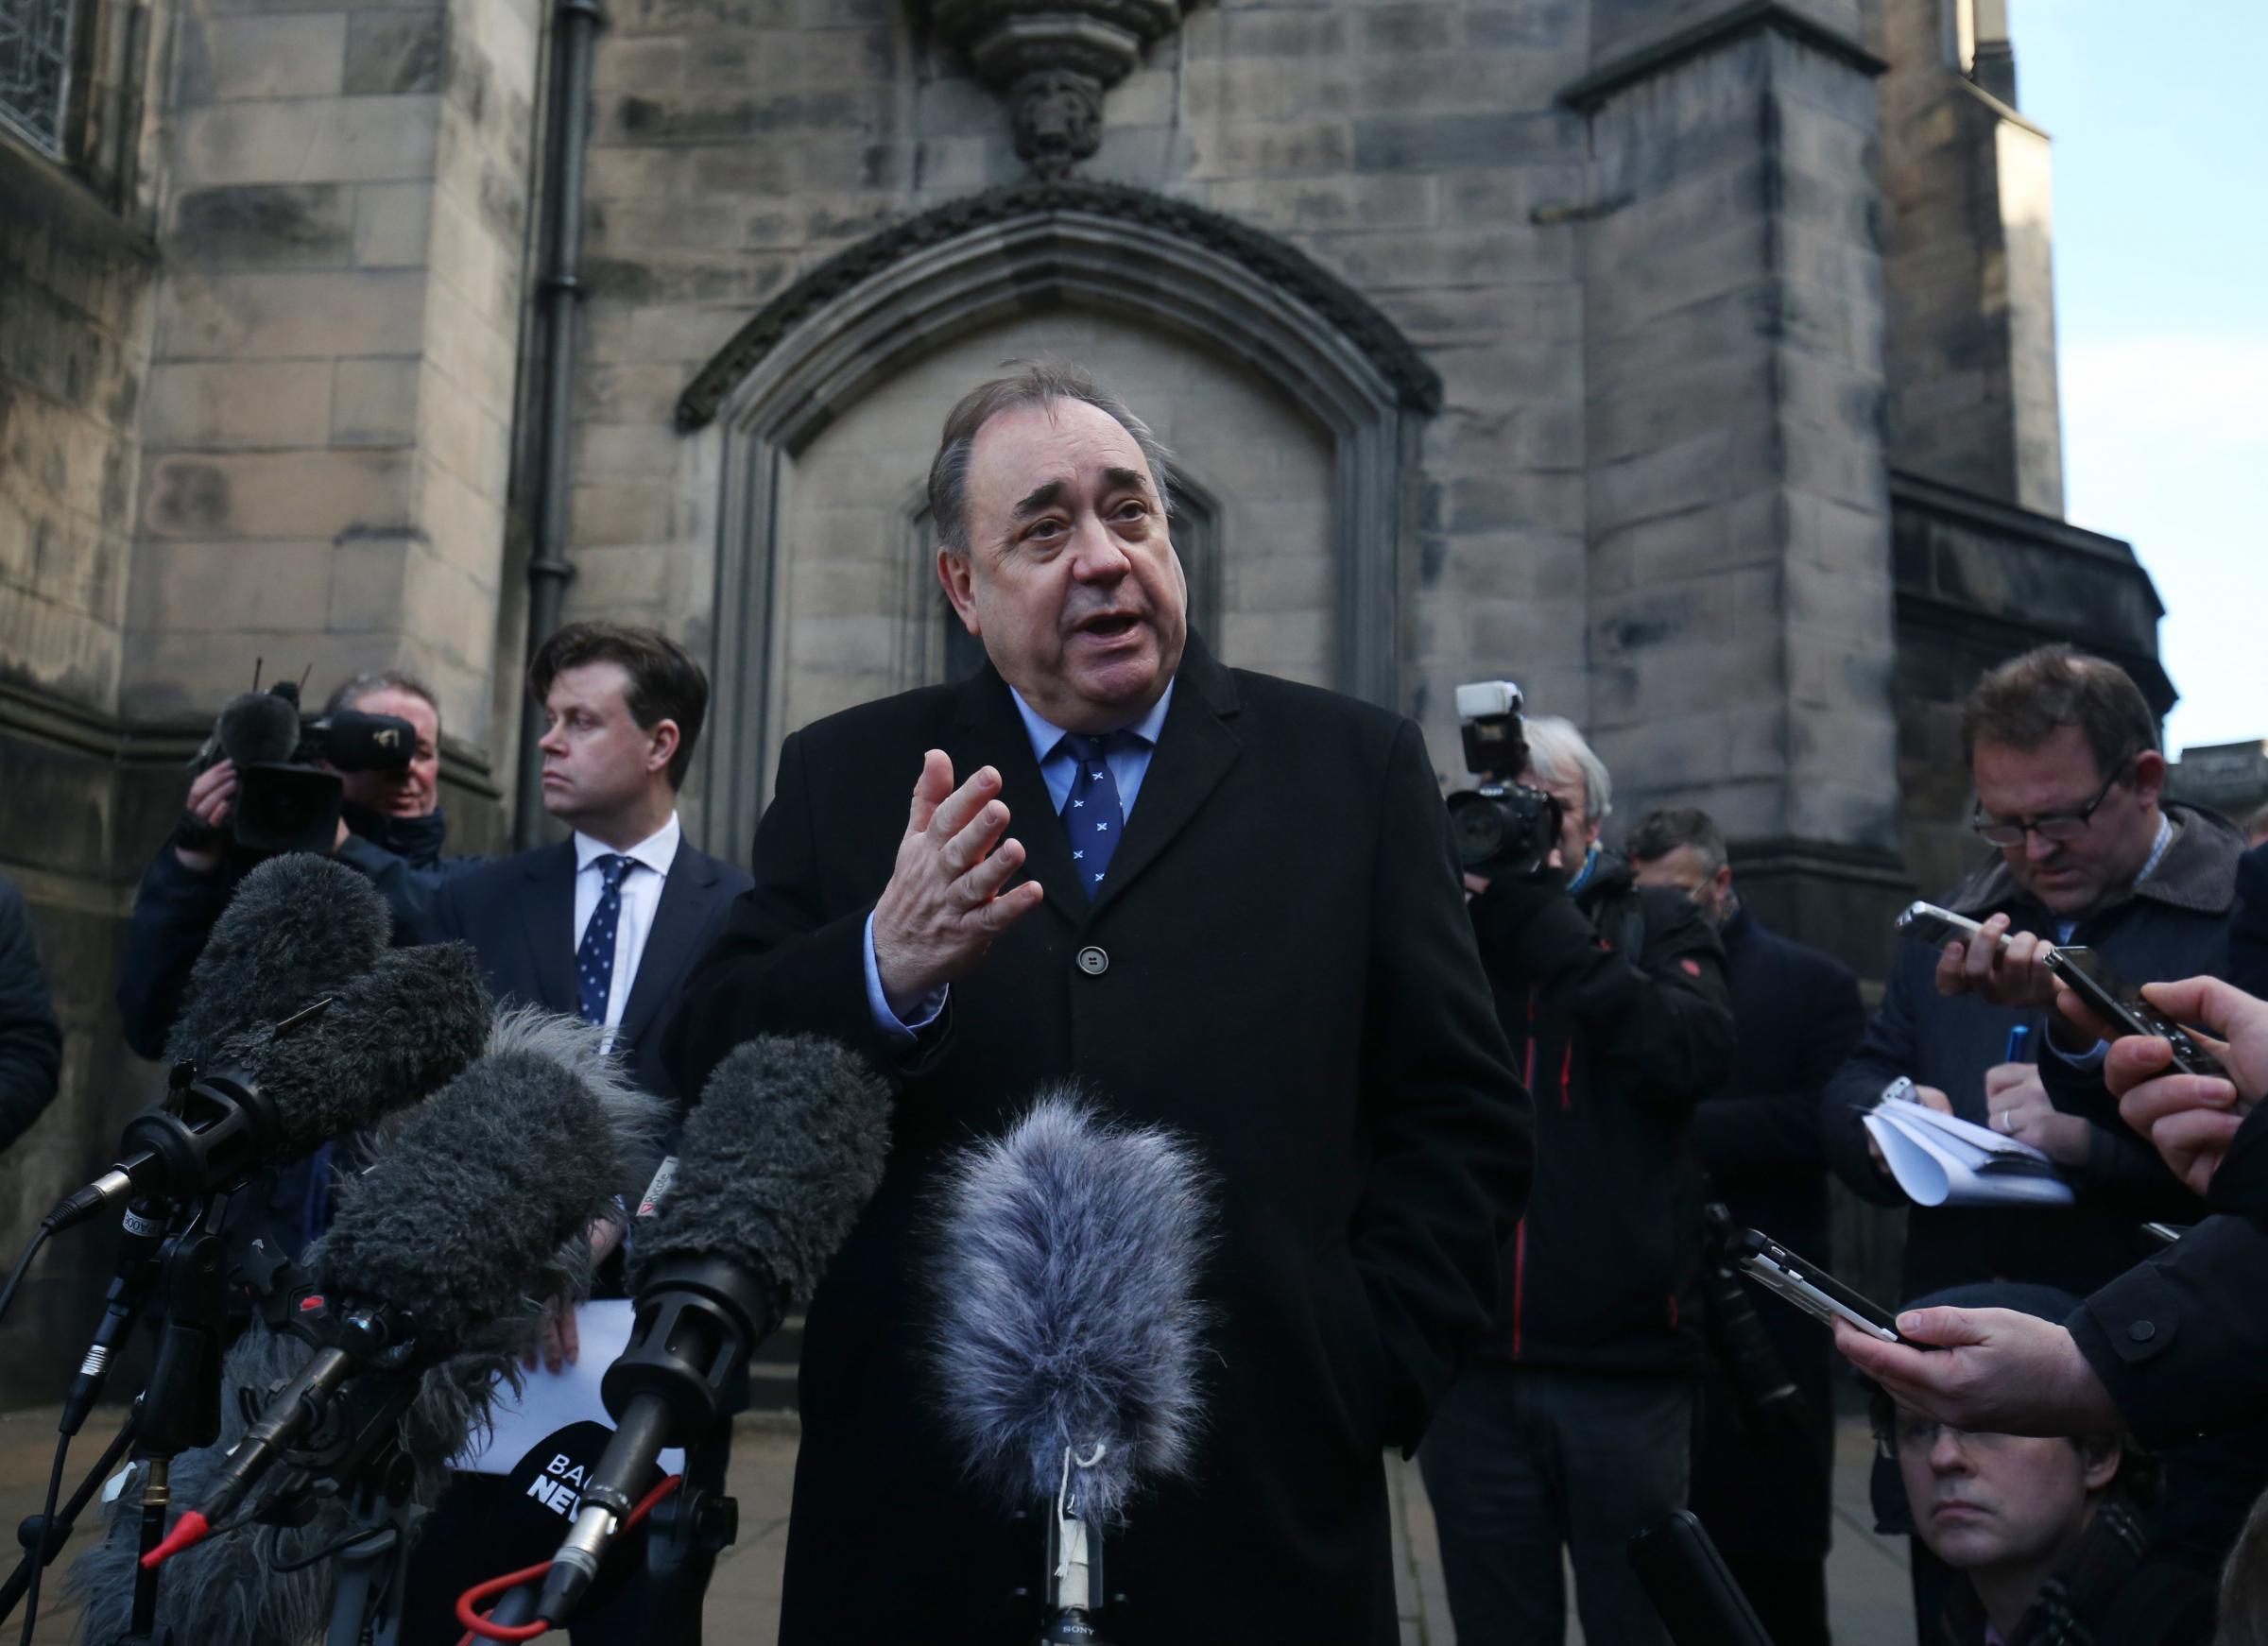 Alex Salmond probe: MSPs seek clarification on court payments